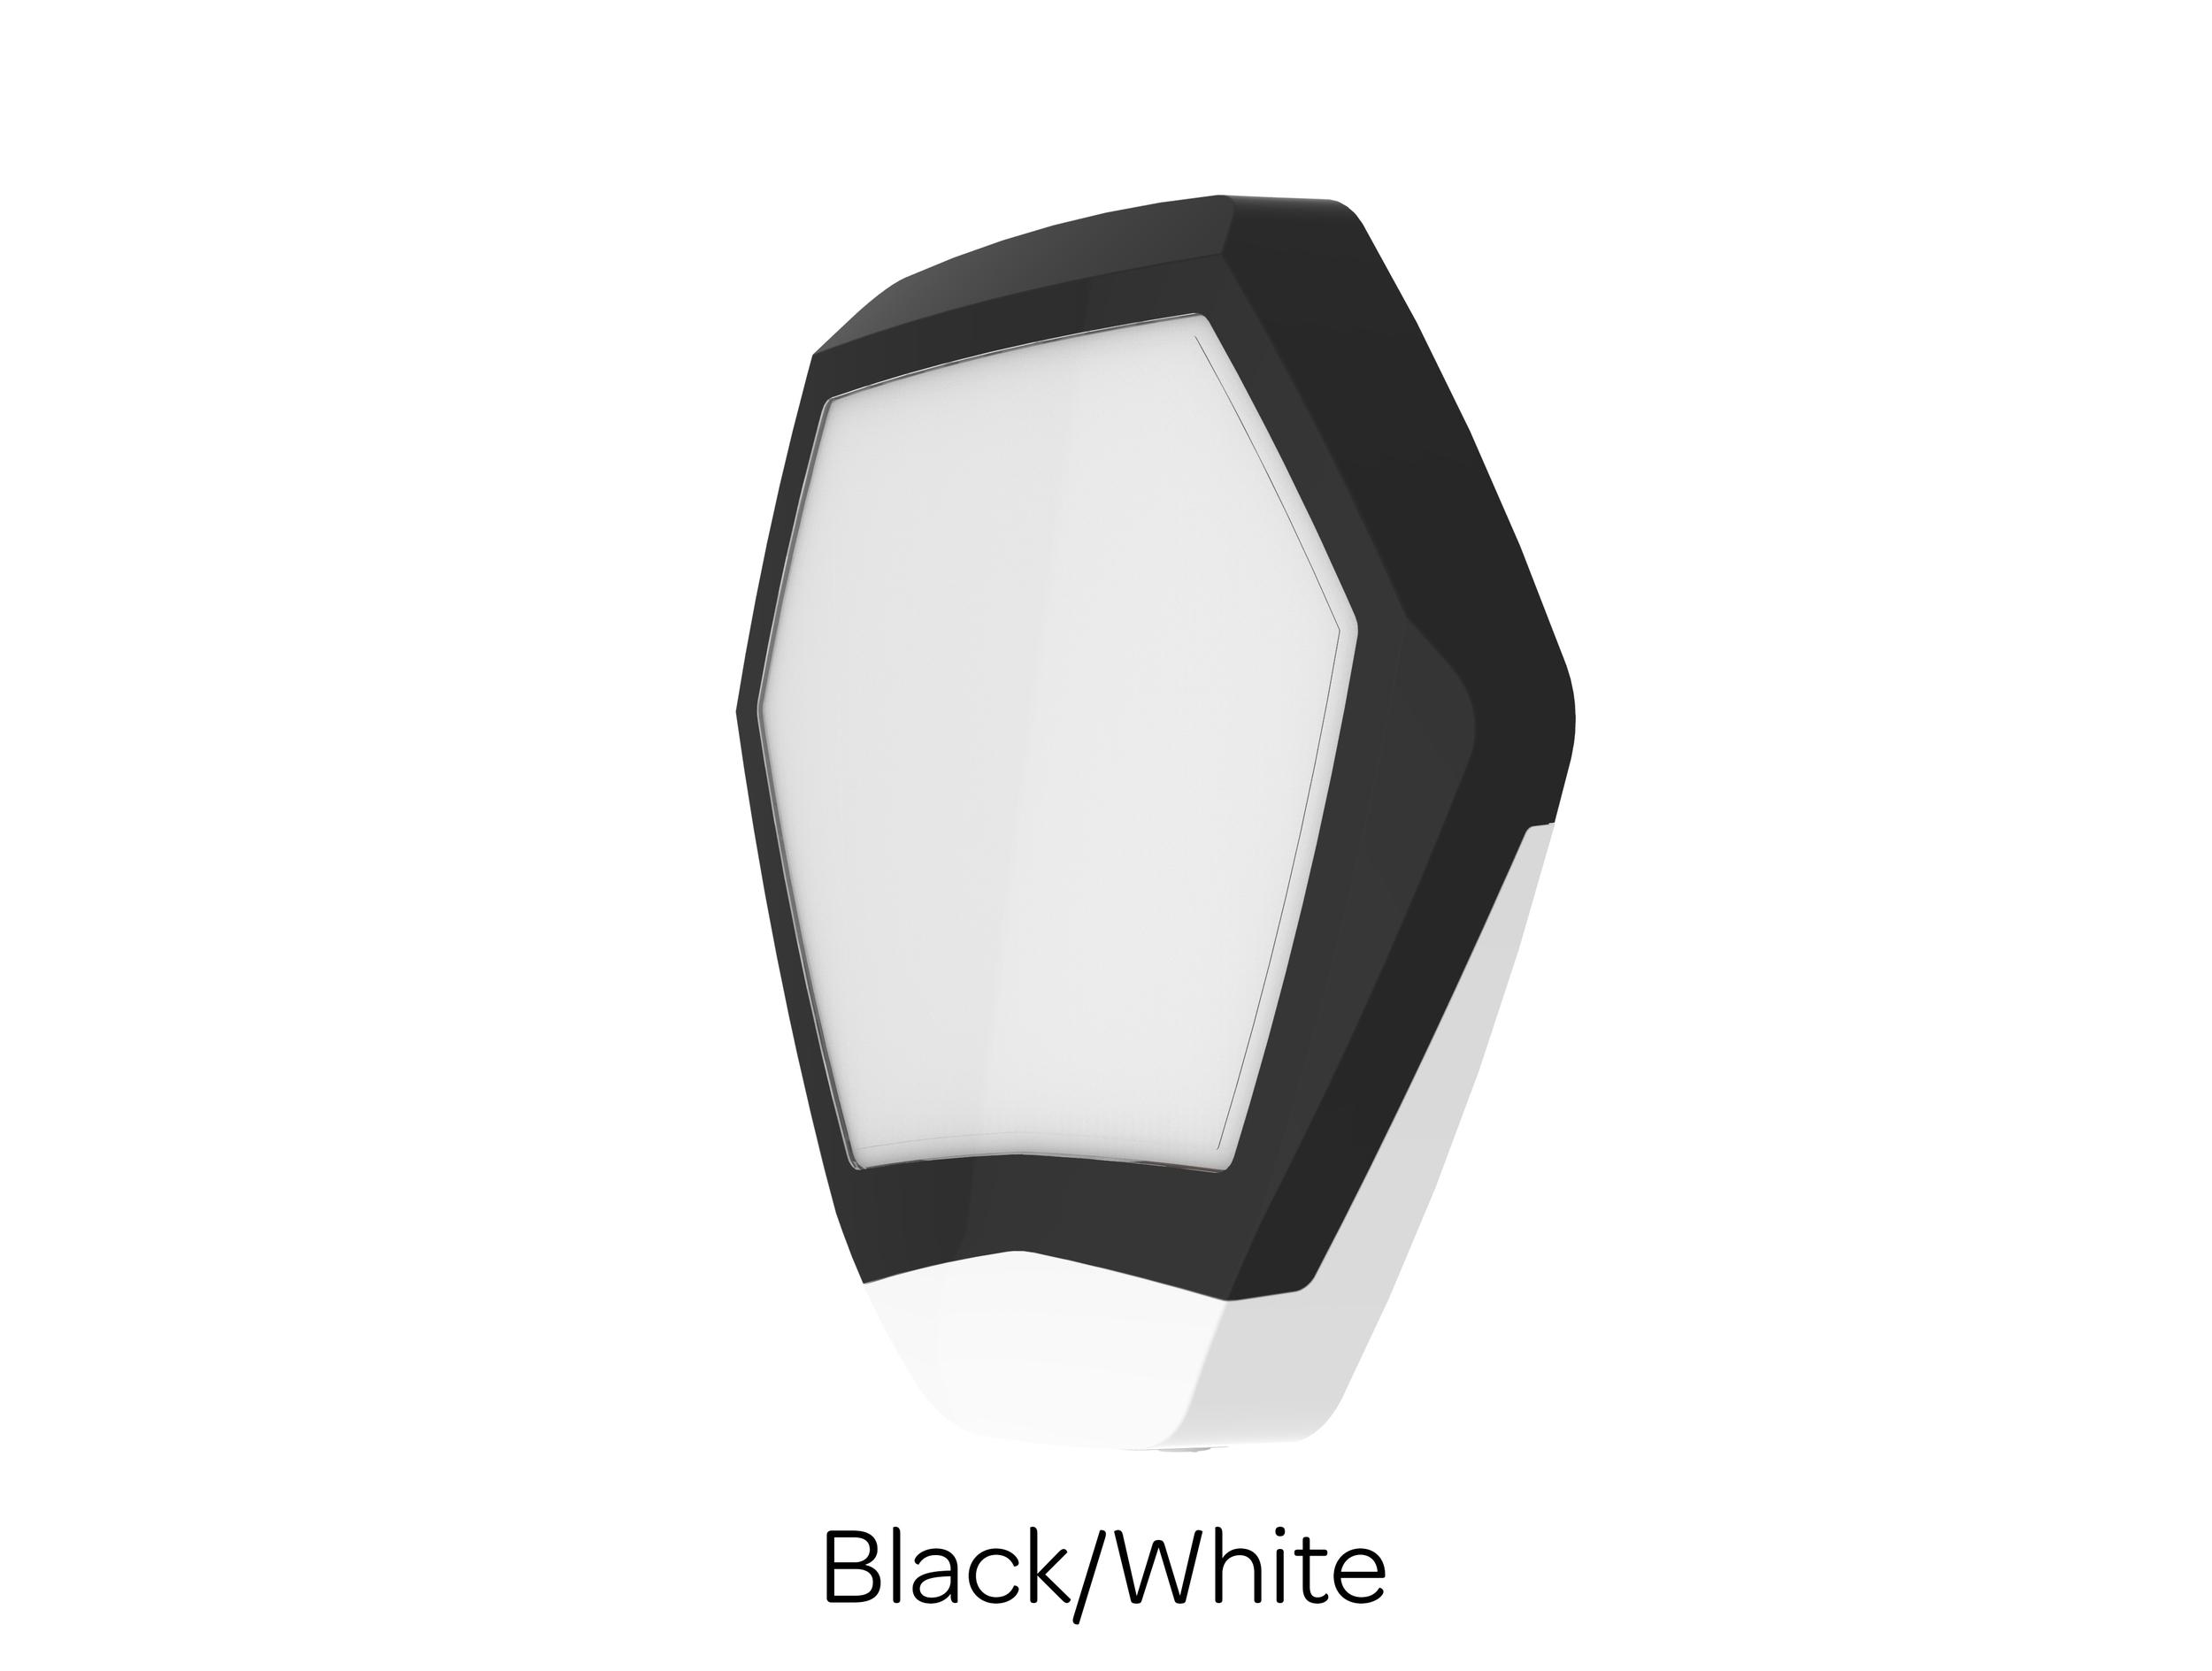 Odyssey X3 Cover Black/White